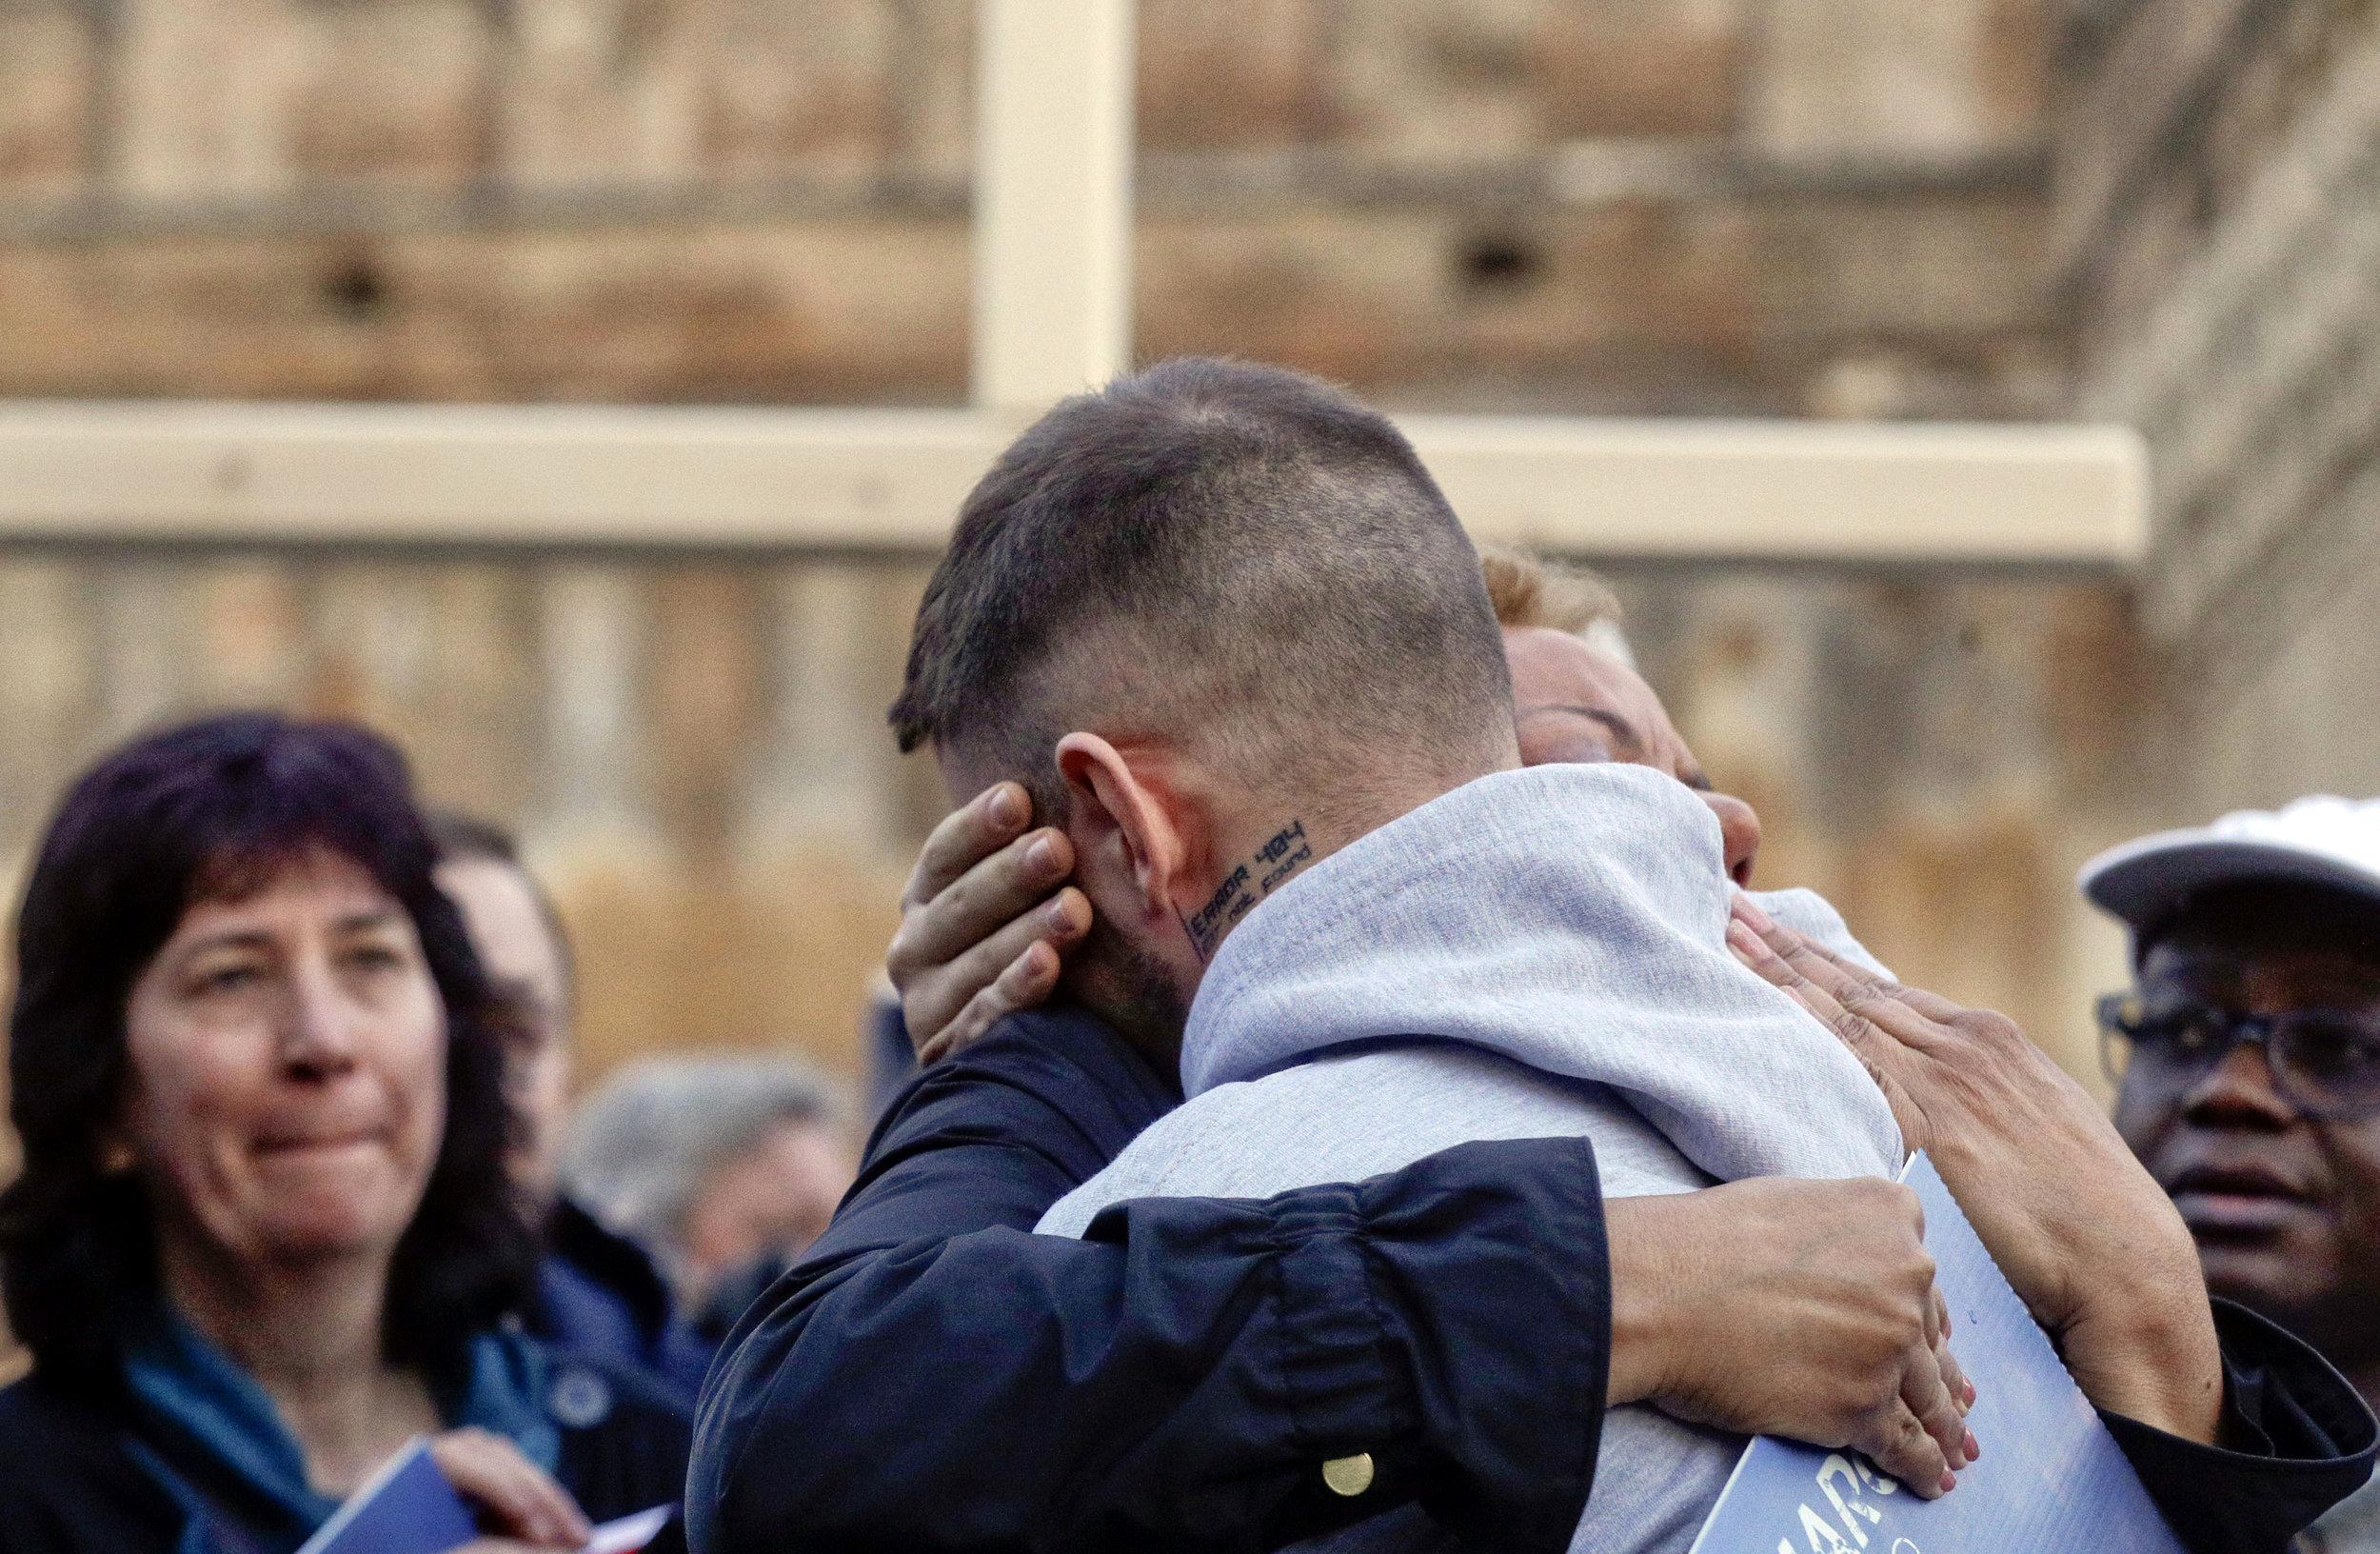 Survivors of clergy sex abuse hug during a twilight vigil prayer near Castle Sant' Angelo, in Rome on Thursday during a landmark sex abuse prevention summit. AP Photo/Gregorio Borgia